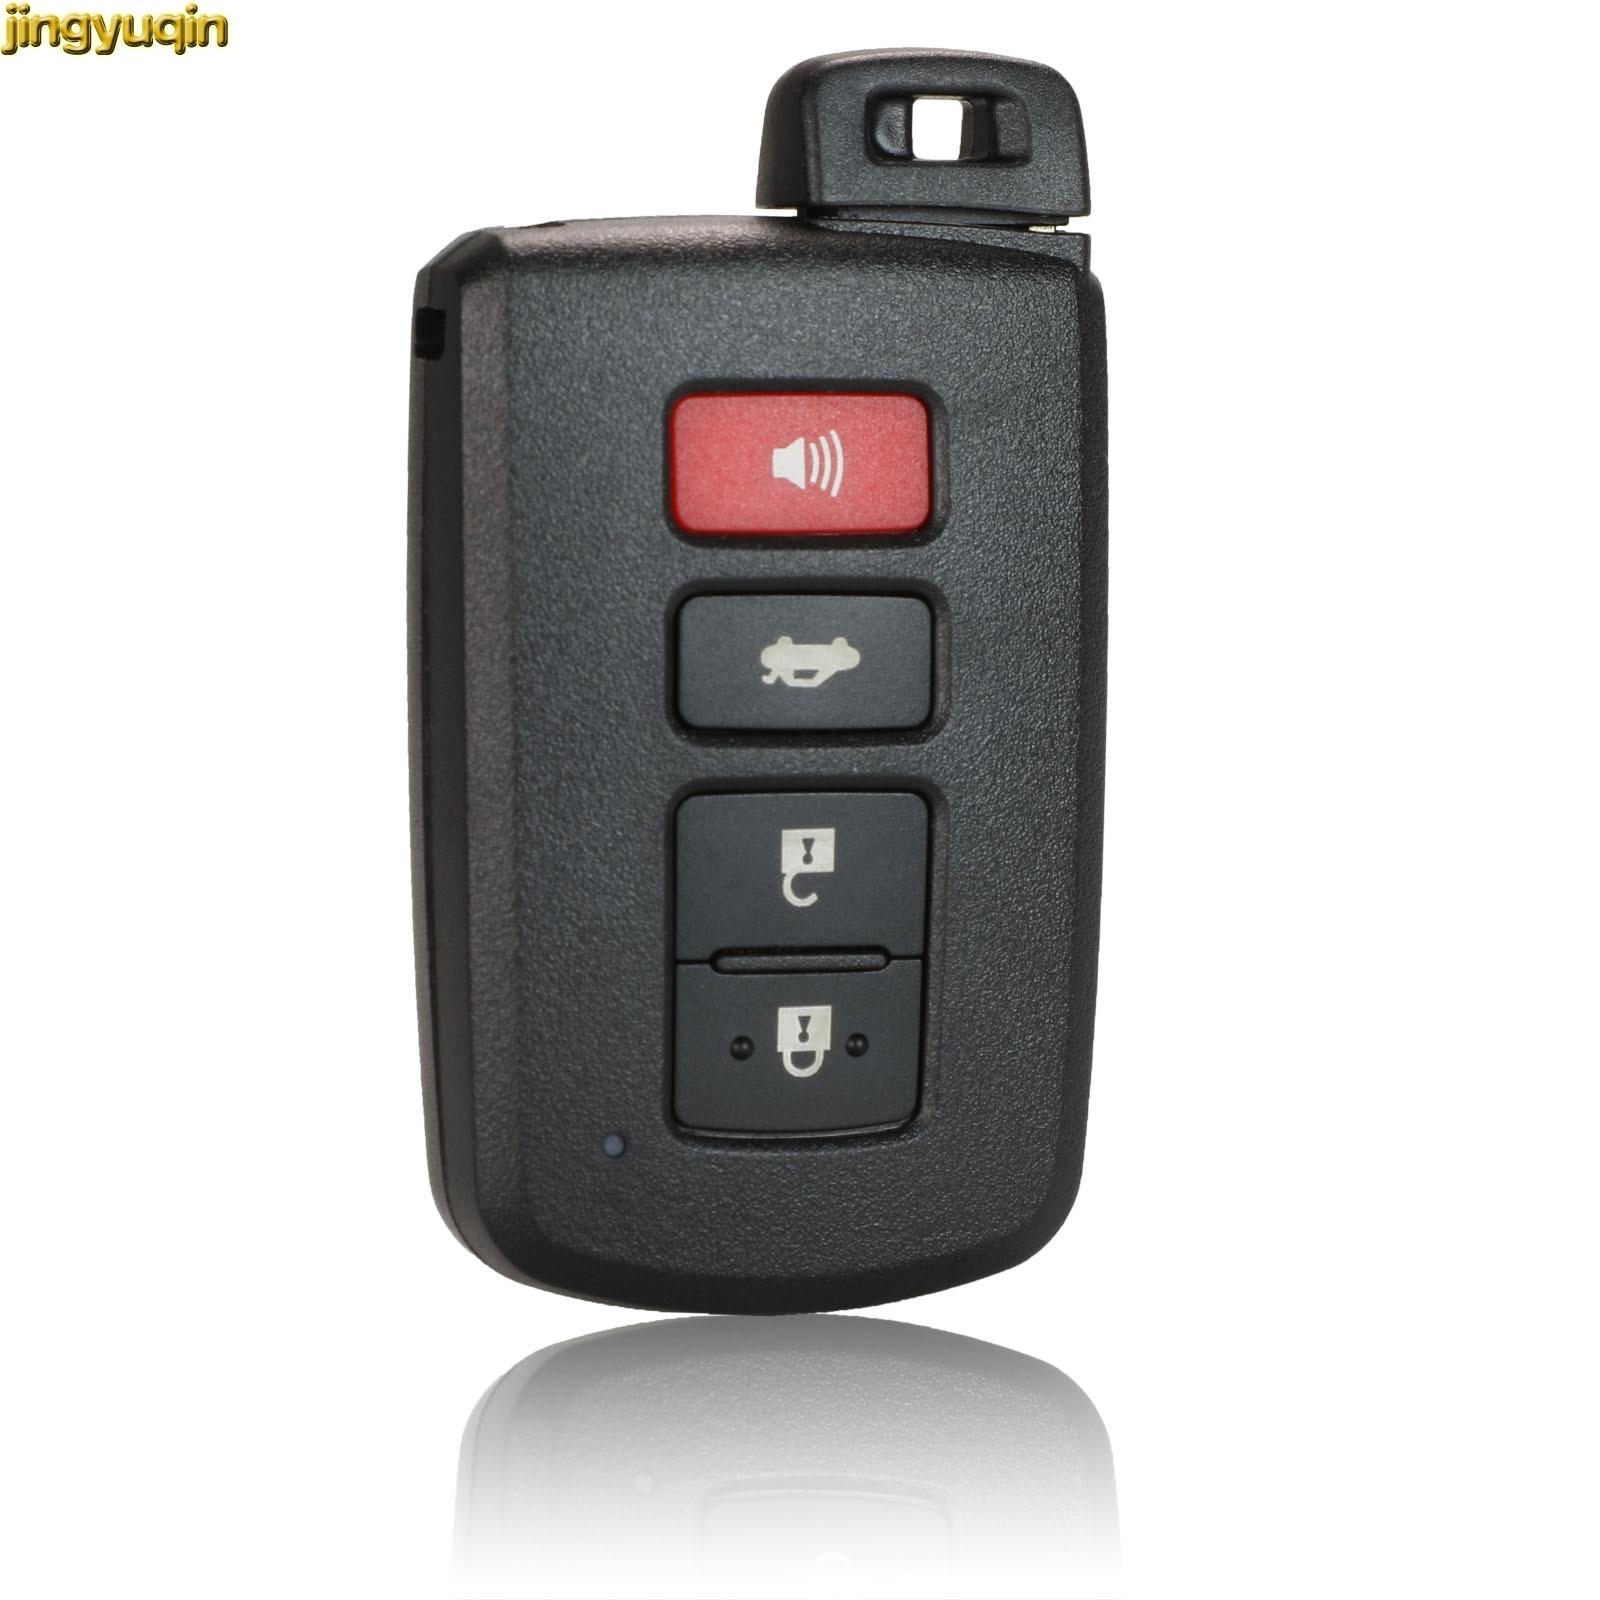 Jinyuqin remoto clave Shell para Toyota Camry Avalon RAV4 Corolla Highlander 4 botones llave inteligente Fob vivienda hoja sin cortar